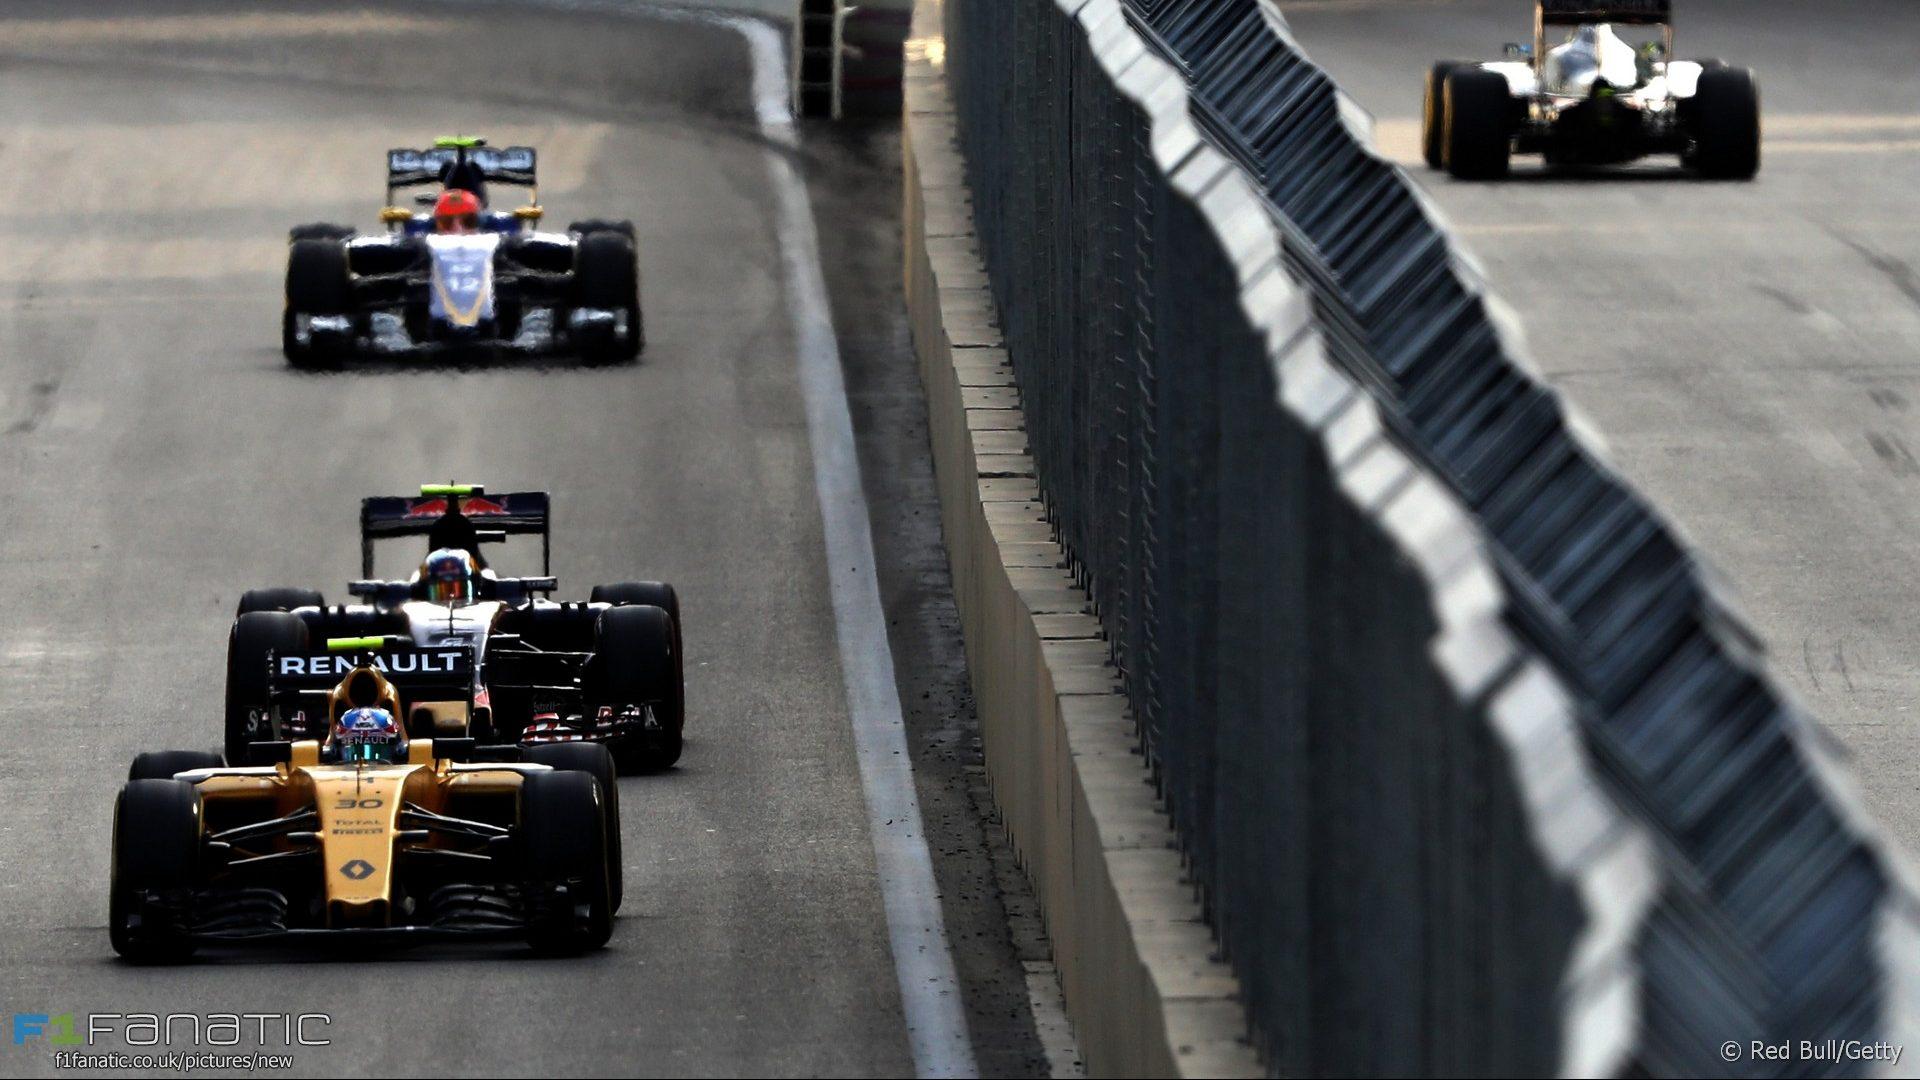 Jolyon Palmer, Renault, Baku City Circuit, 2016